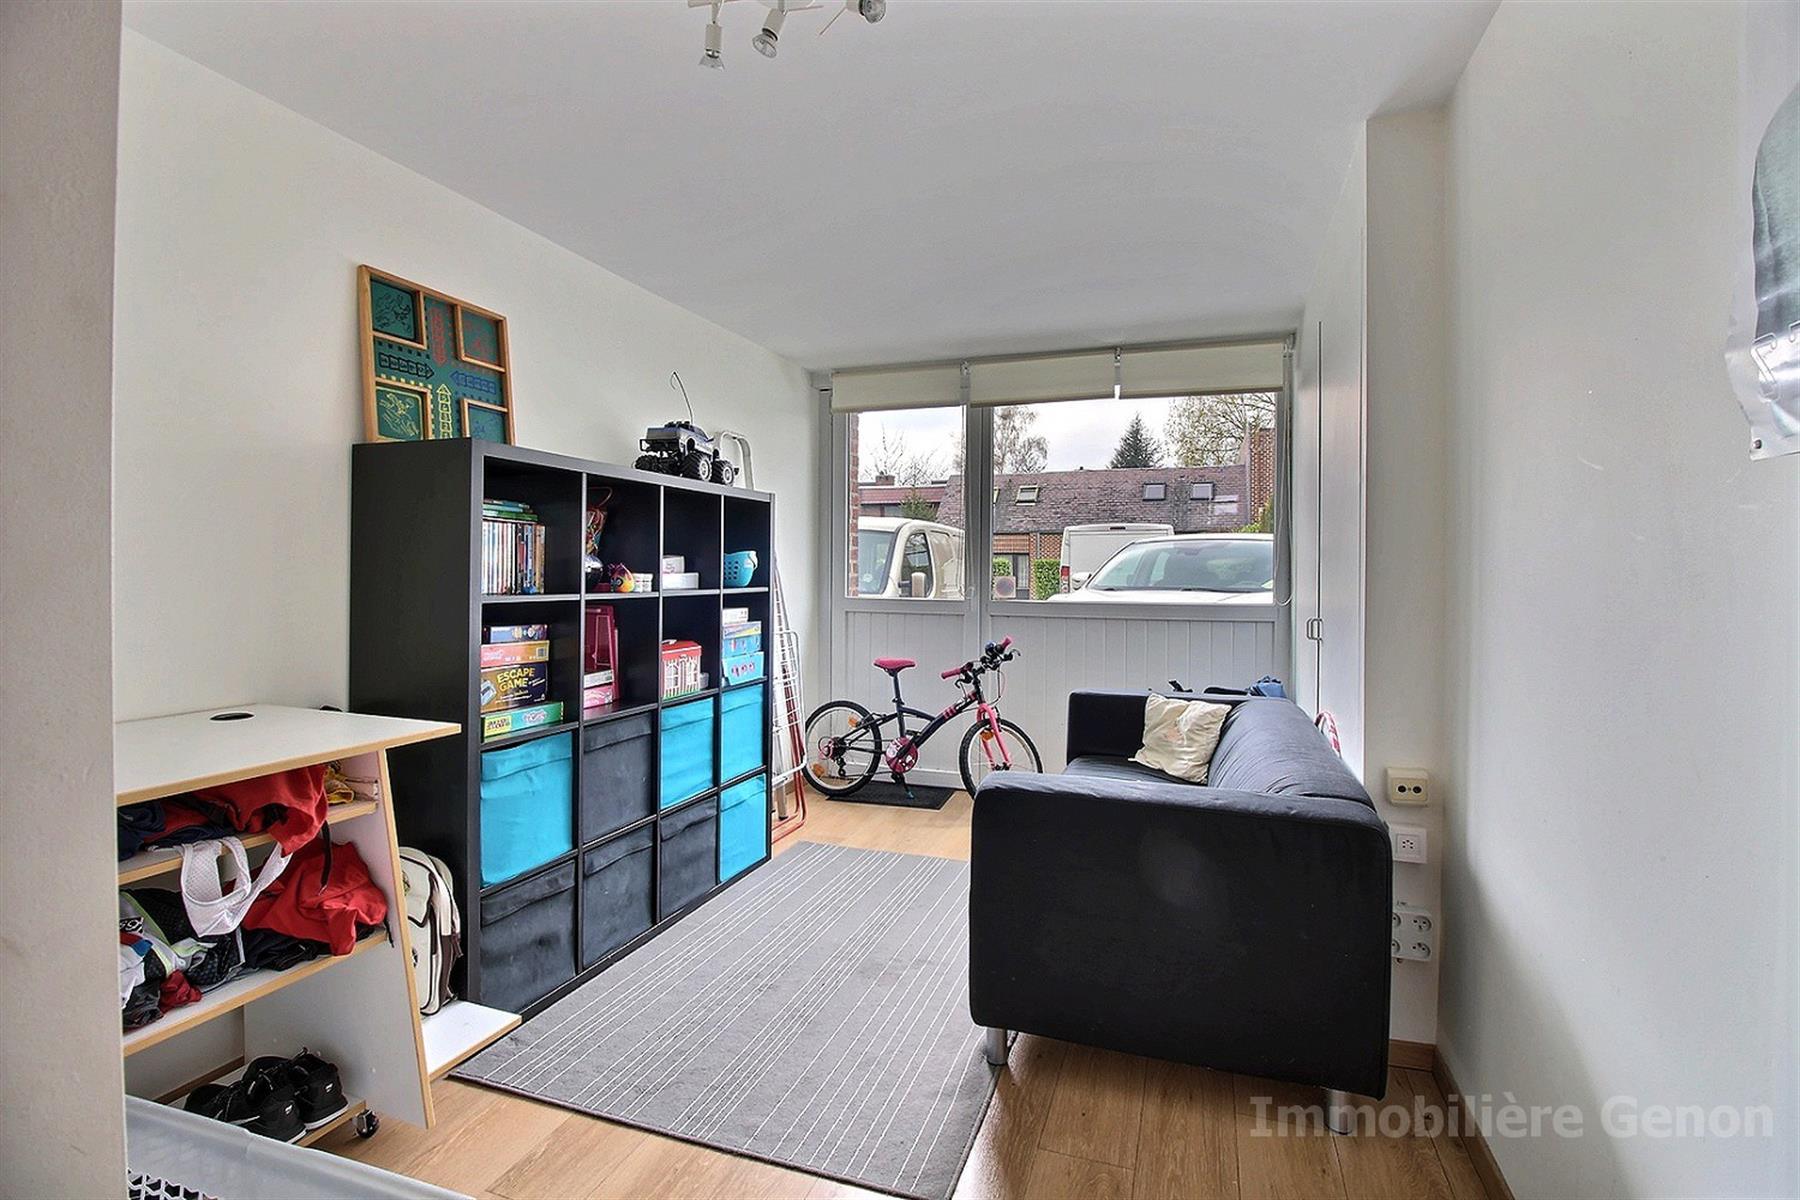 Maison - Ottignies-Louvain-la-Neuve - #4532084-5